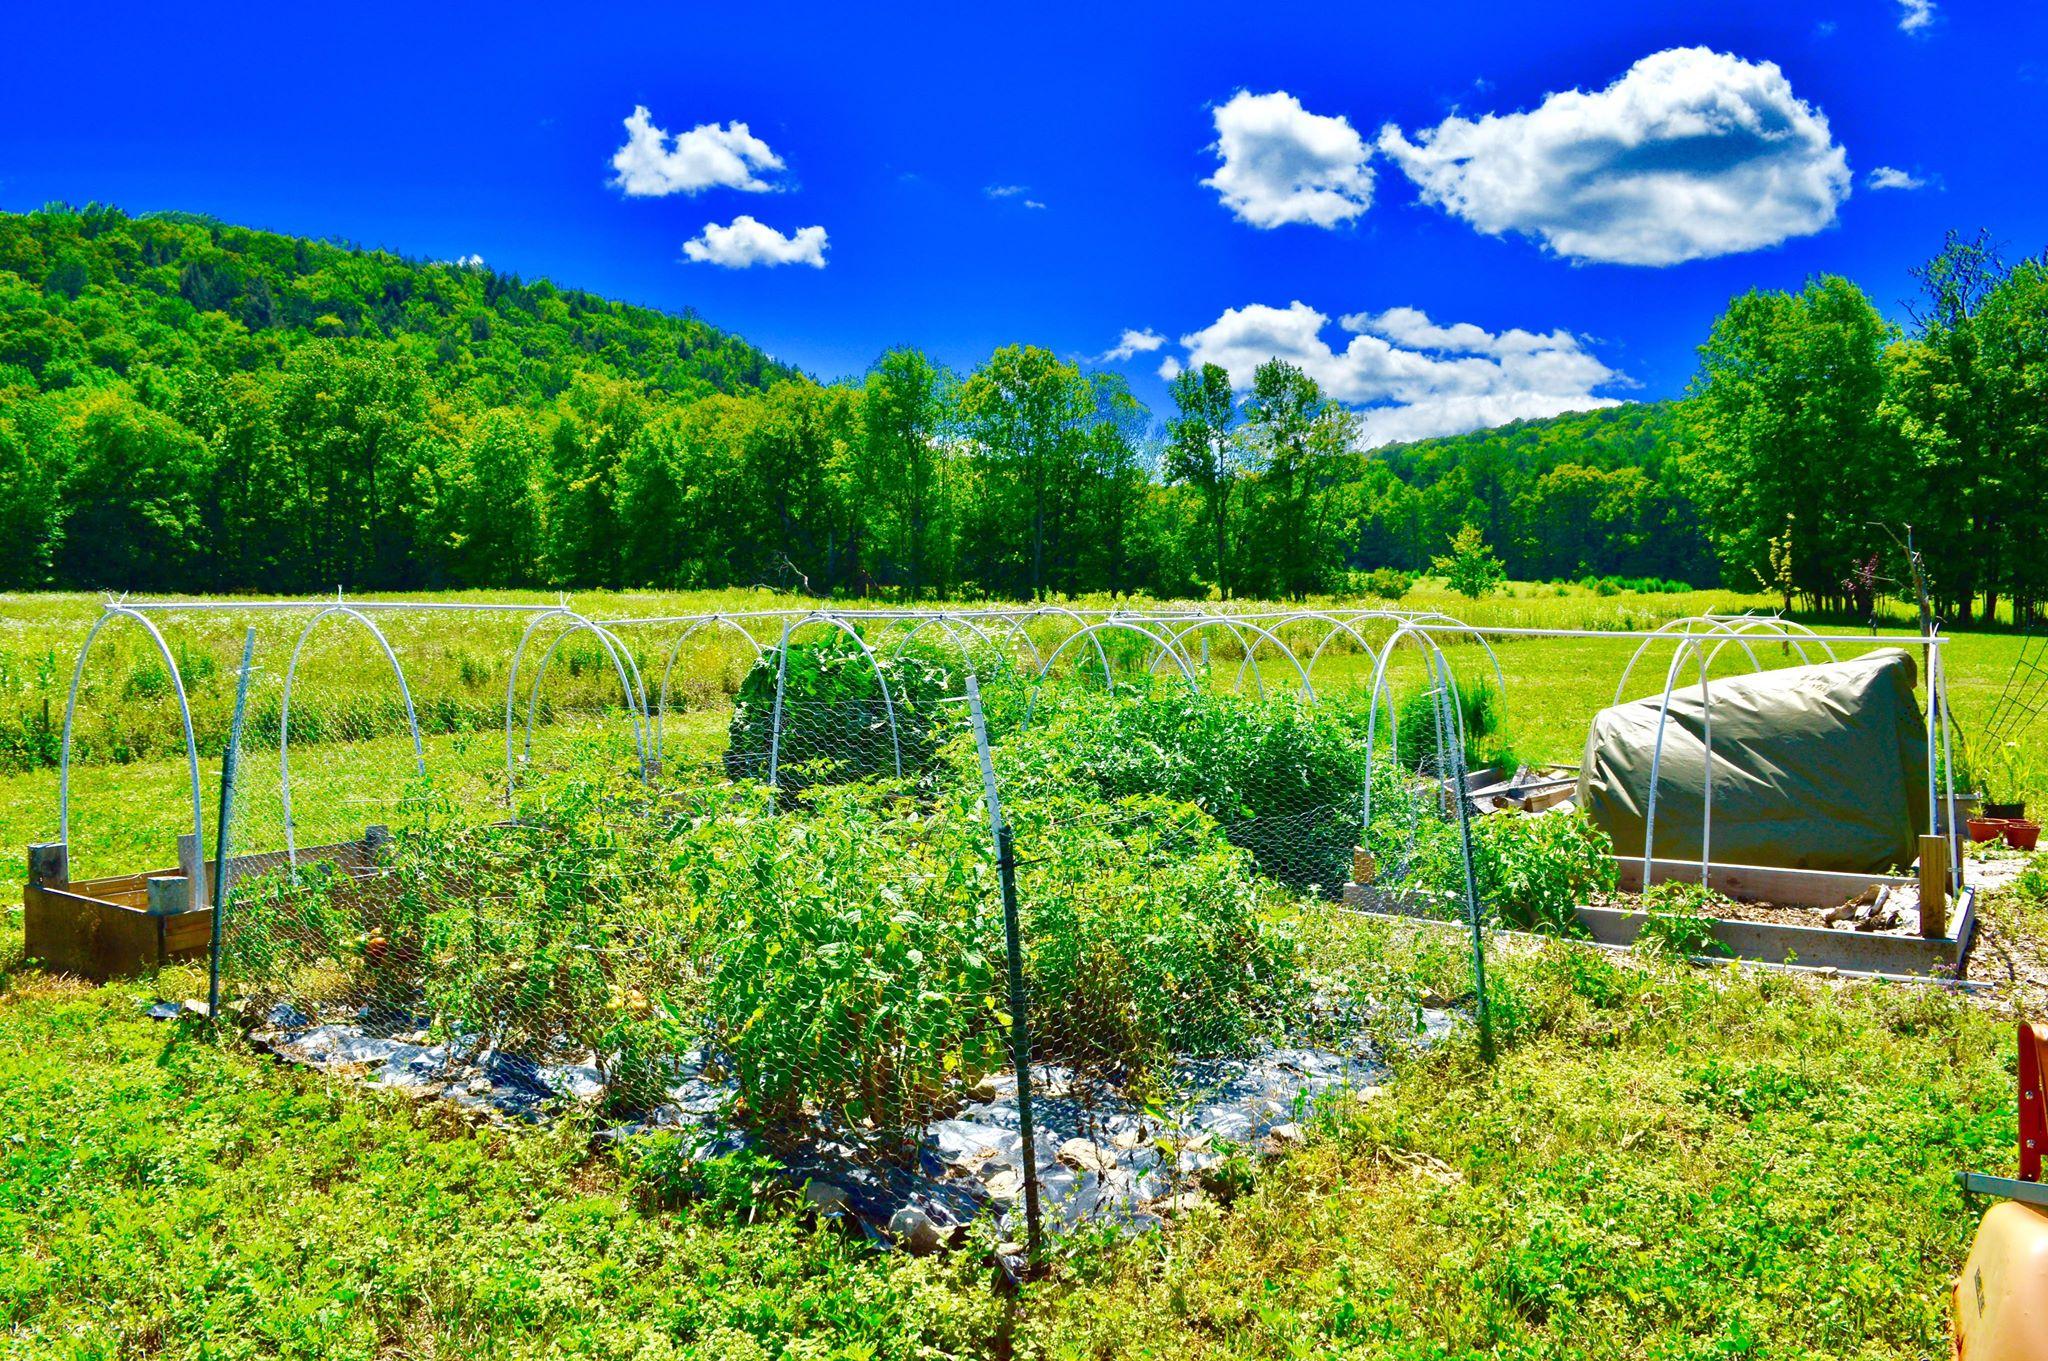 plant based life, vegan life, backyard gardening, renegade garden, square foot gardening, ithaca, modern homestead